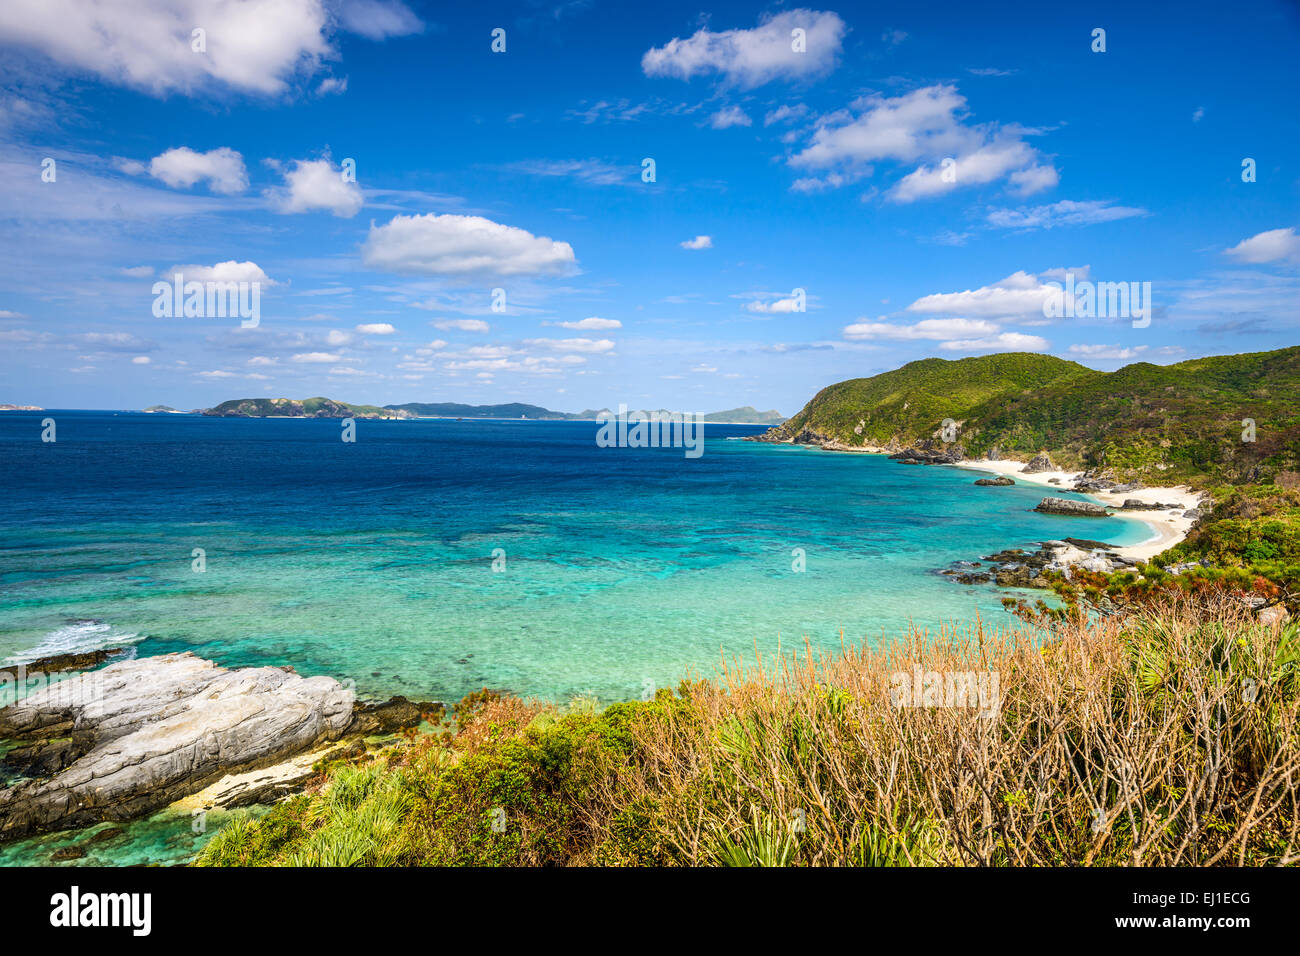 Tokashiki, Okinawa, Japan coastal view at Aharen Beach. - Stock Image